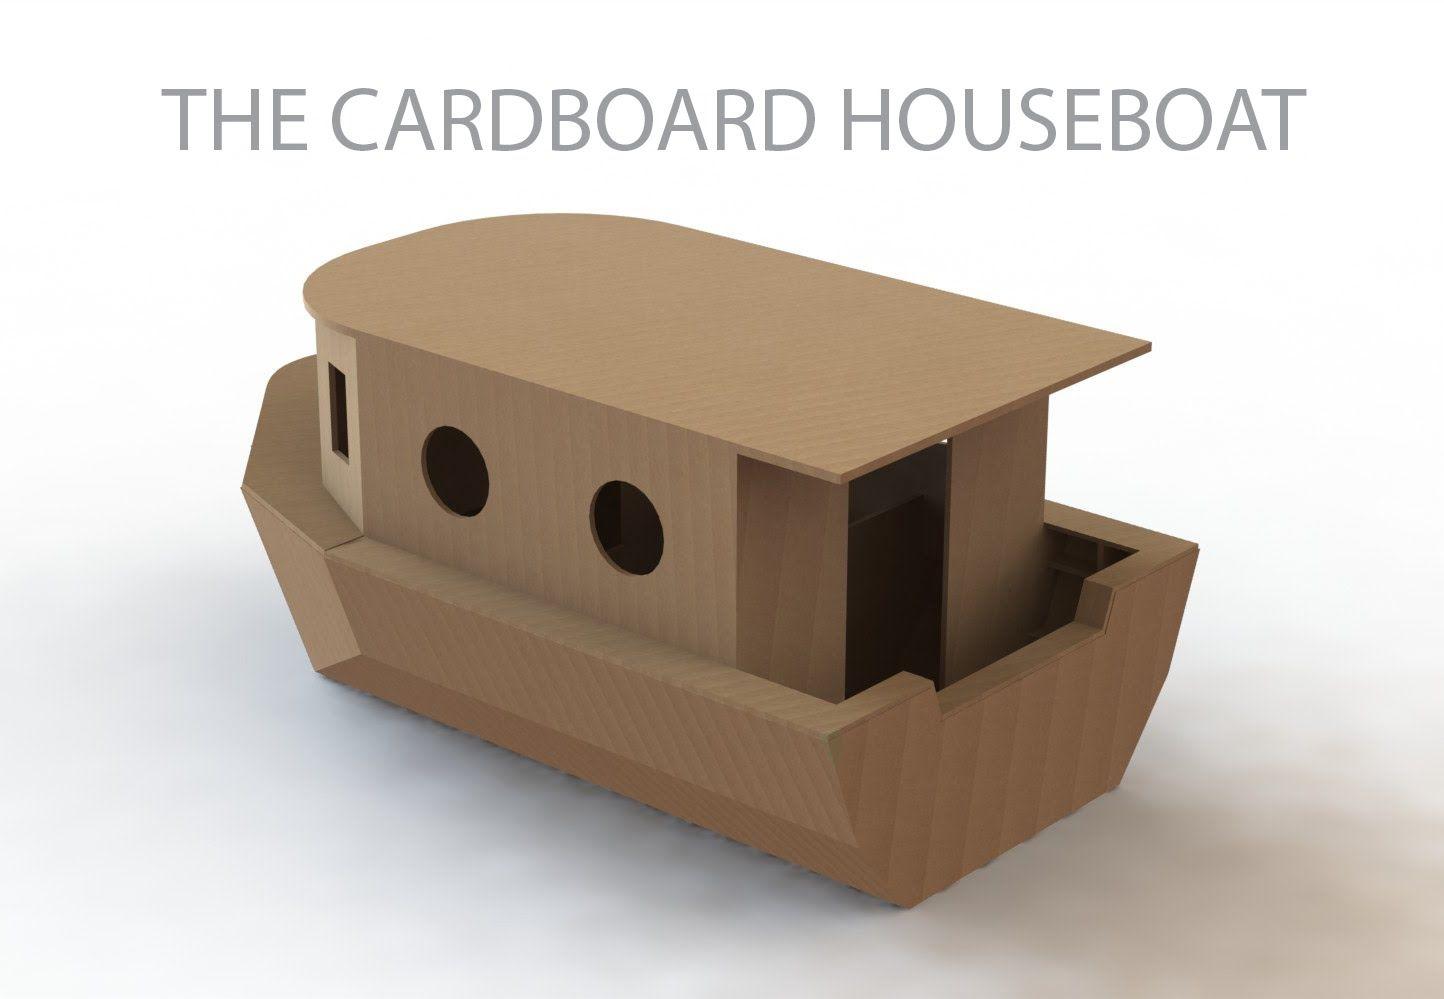 The Cardboard Houseboat